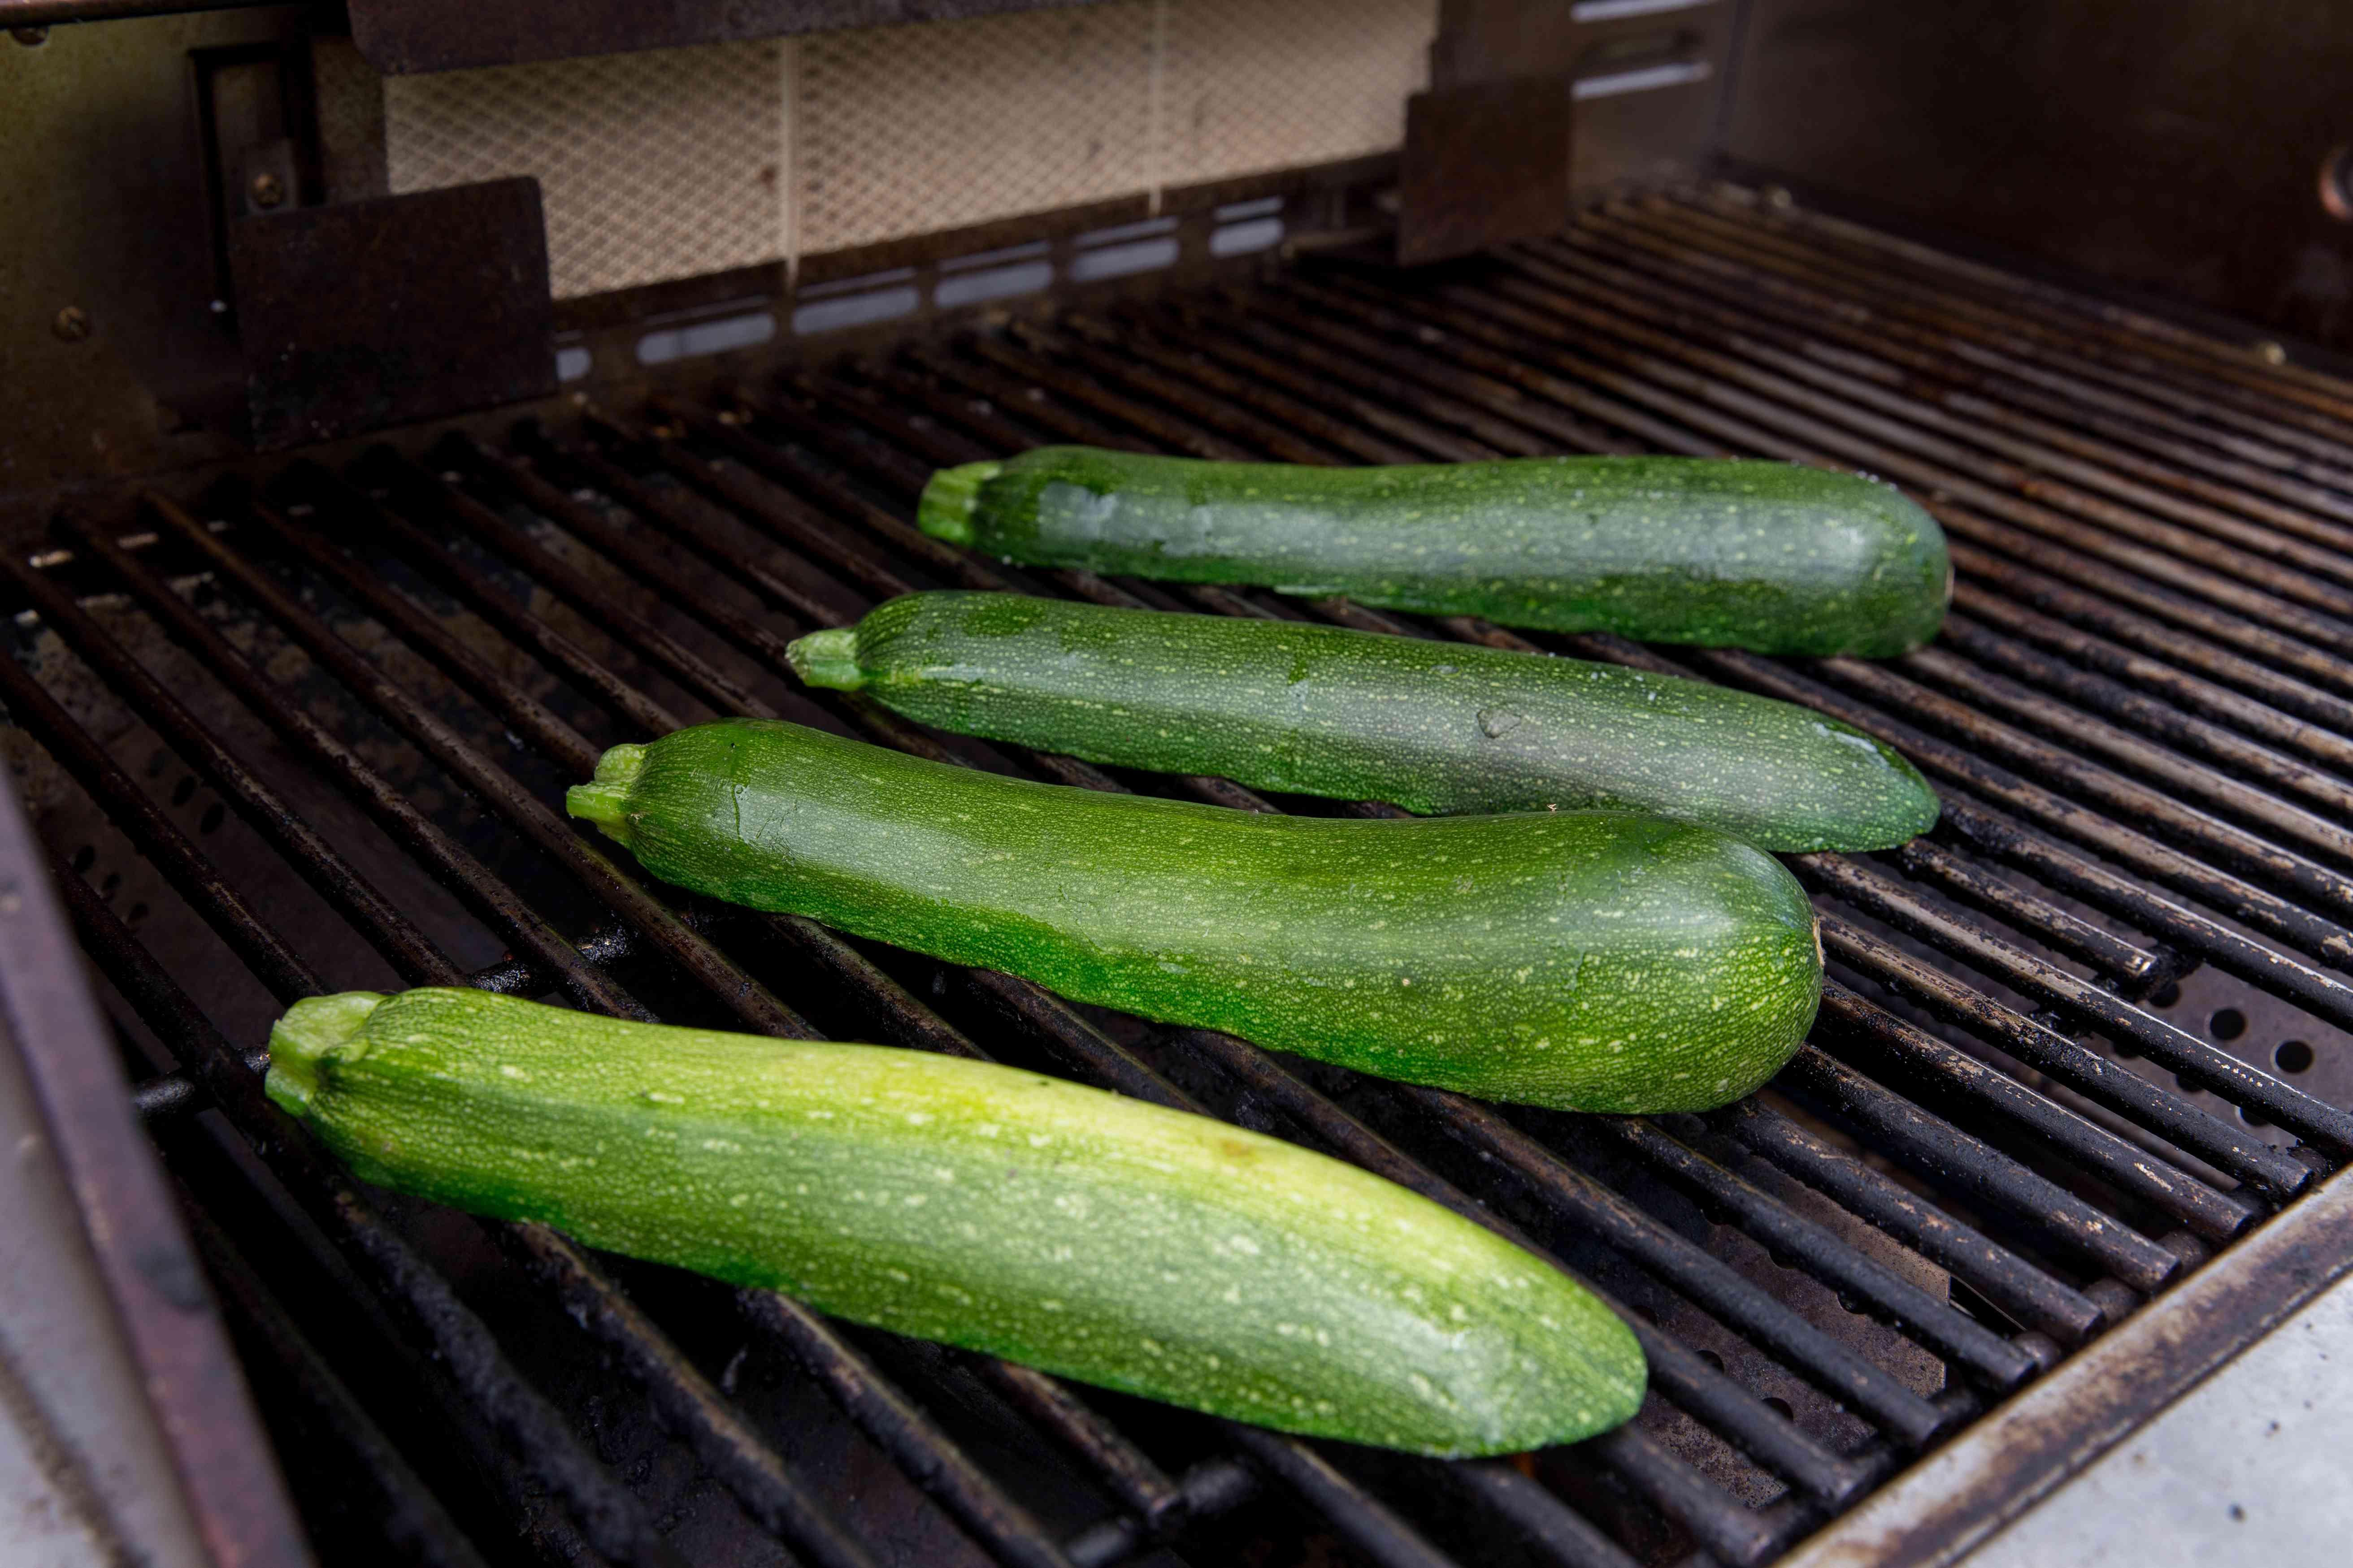 Grilling zucchini boats cut side down to make a grilled zucchini recipe.